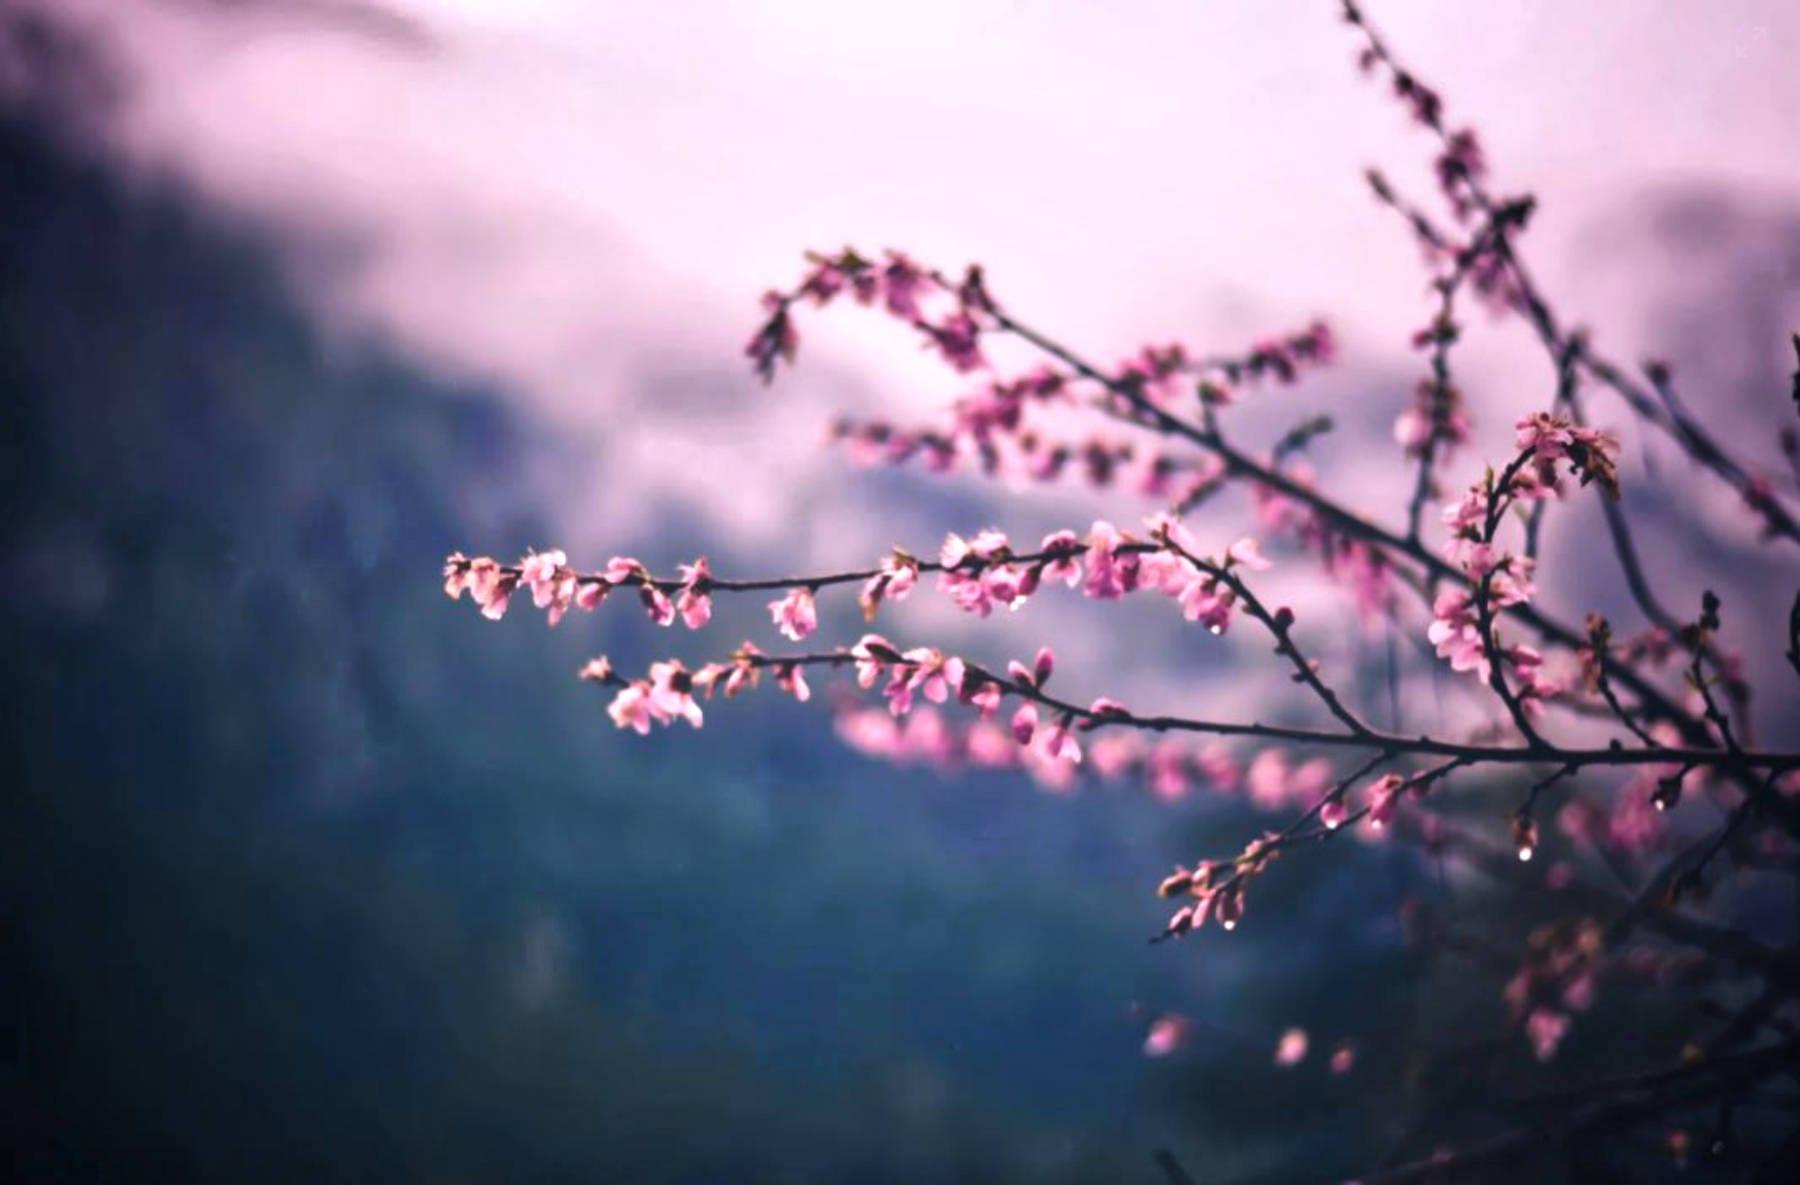 Blossom tree in spring